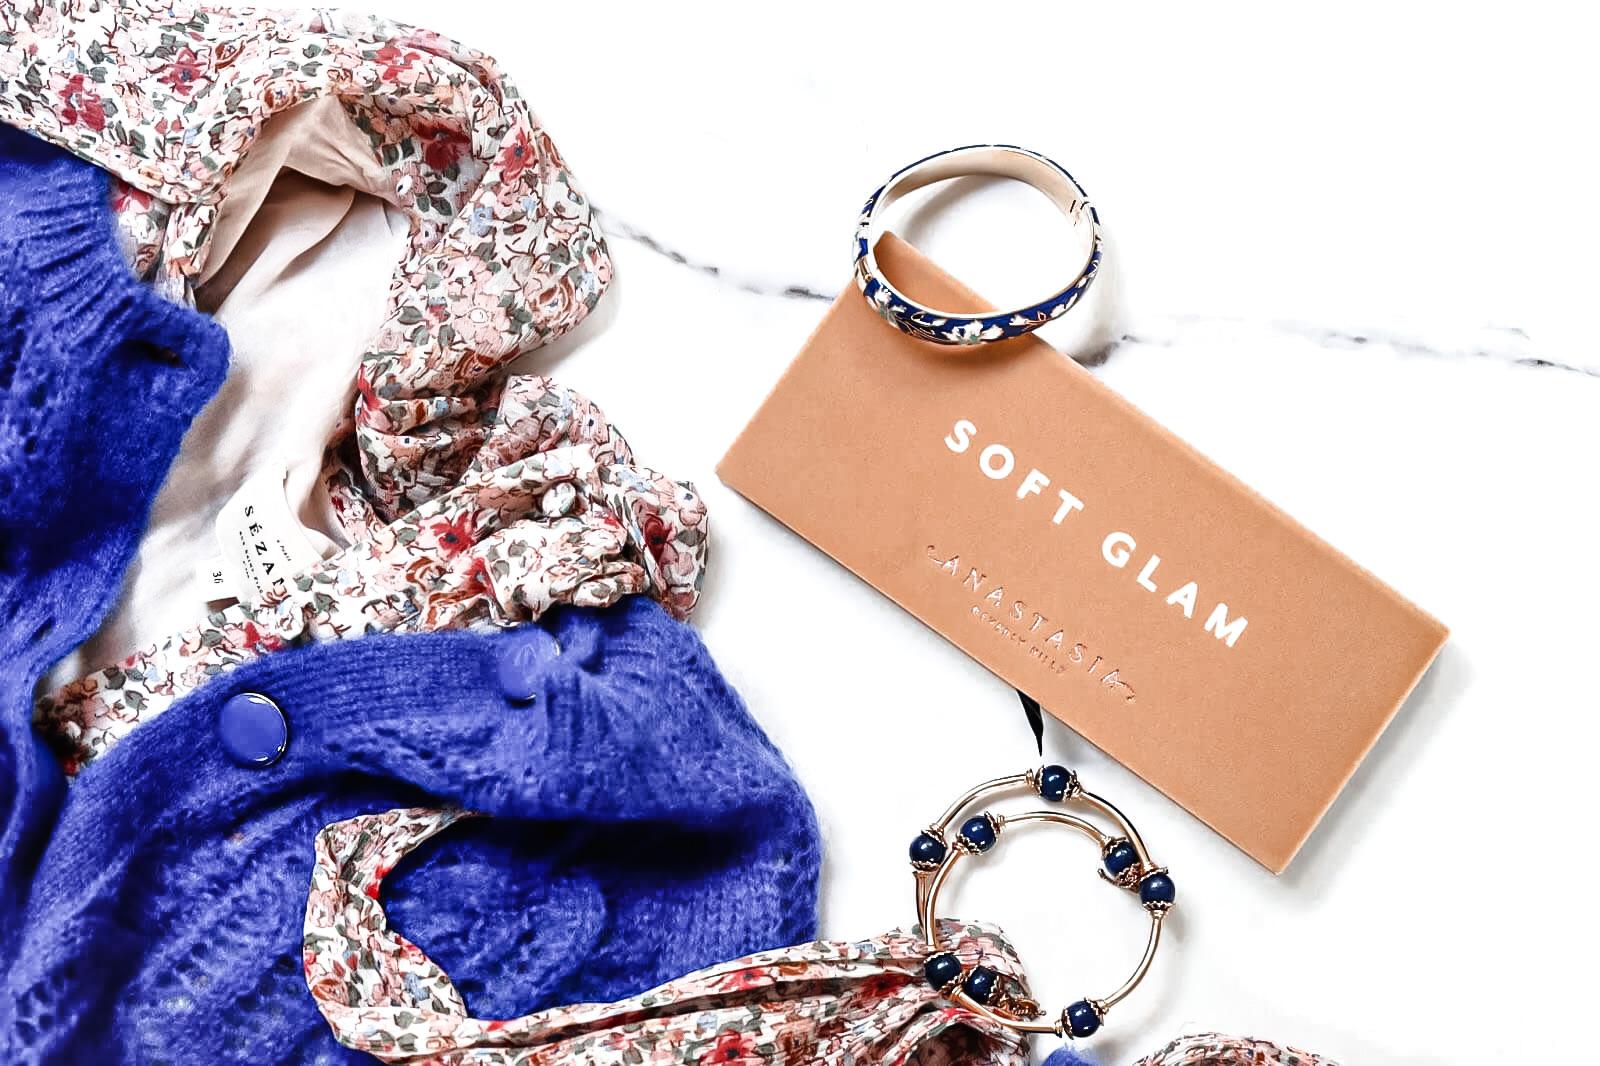 Anastasia Soft Glam Palette Avis